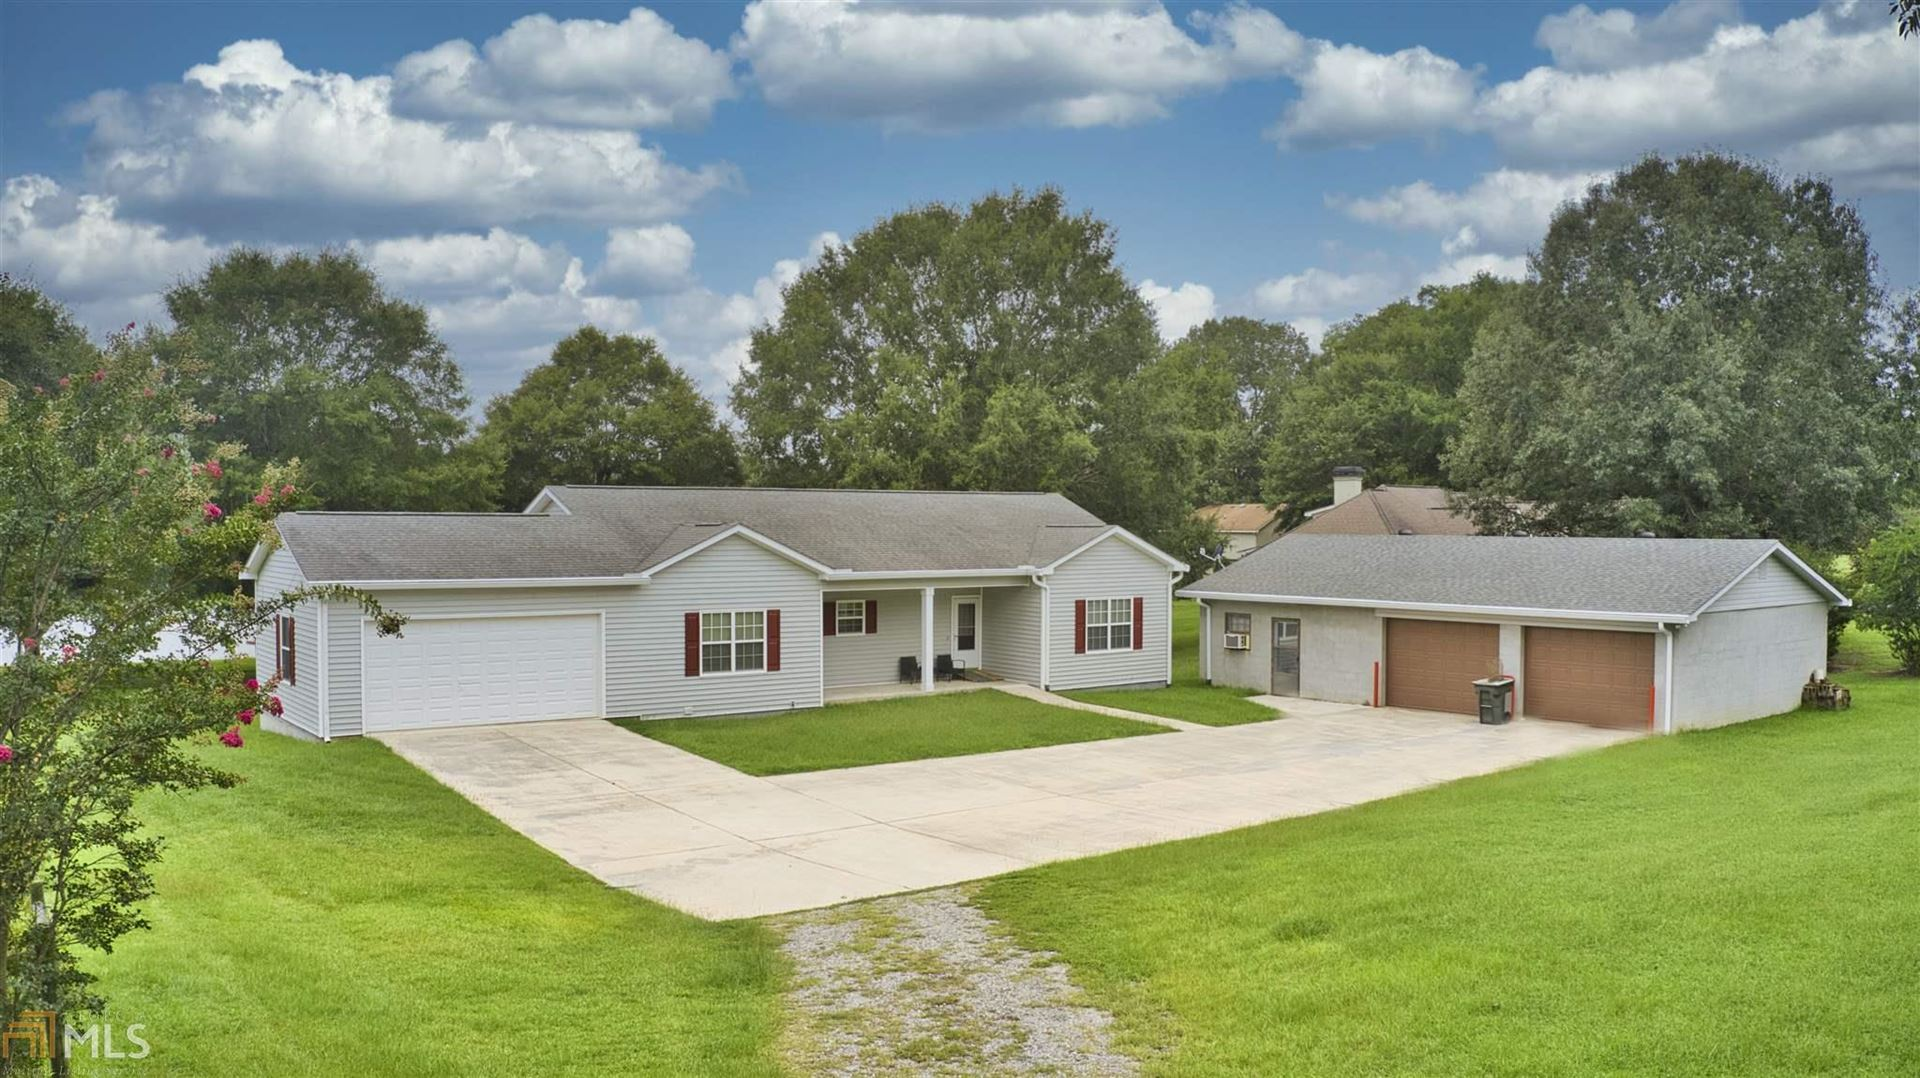 1430 Staci Dr, Greensboro, GA 30642 - MLS#: 8846141